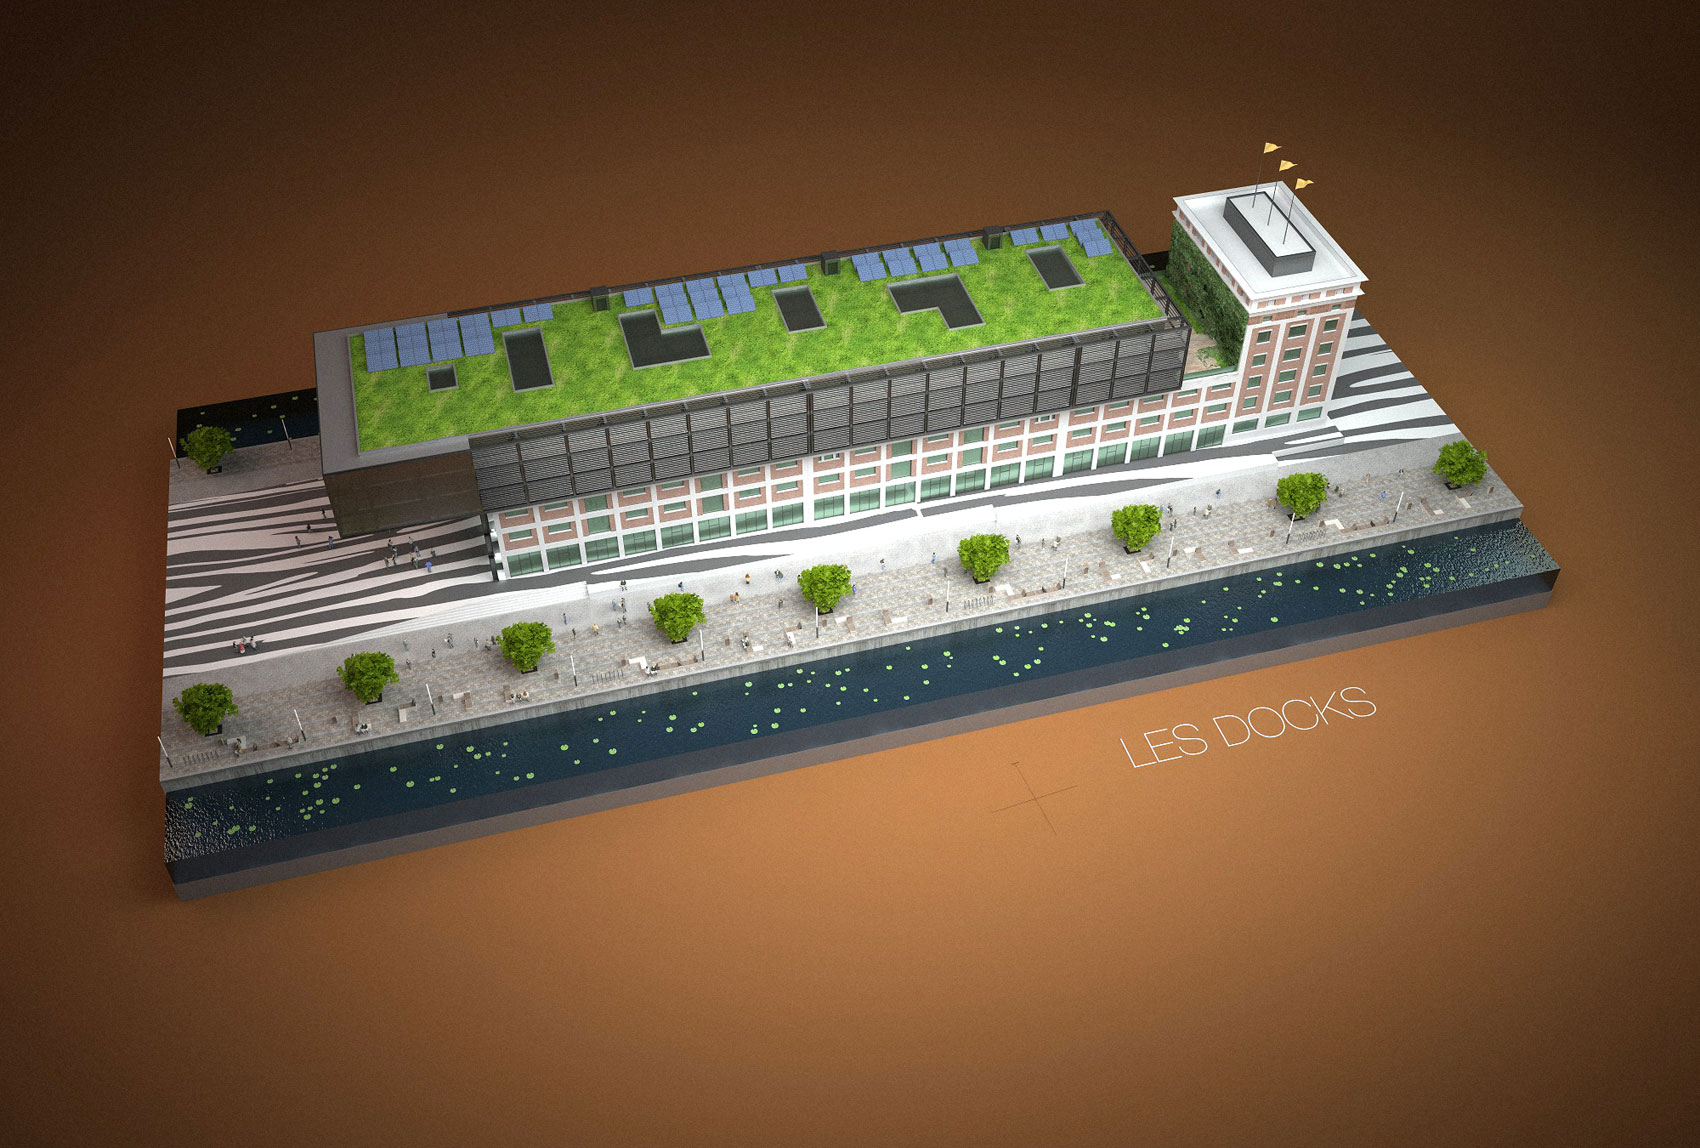 les-docks-2